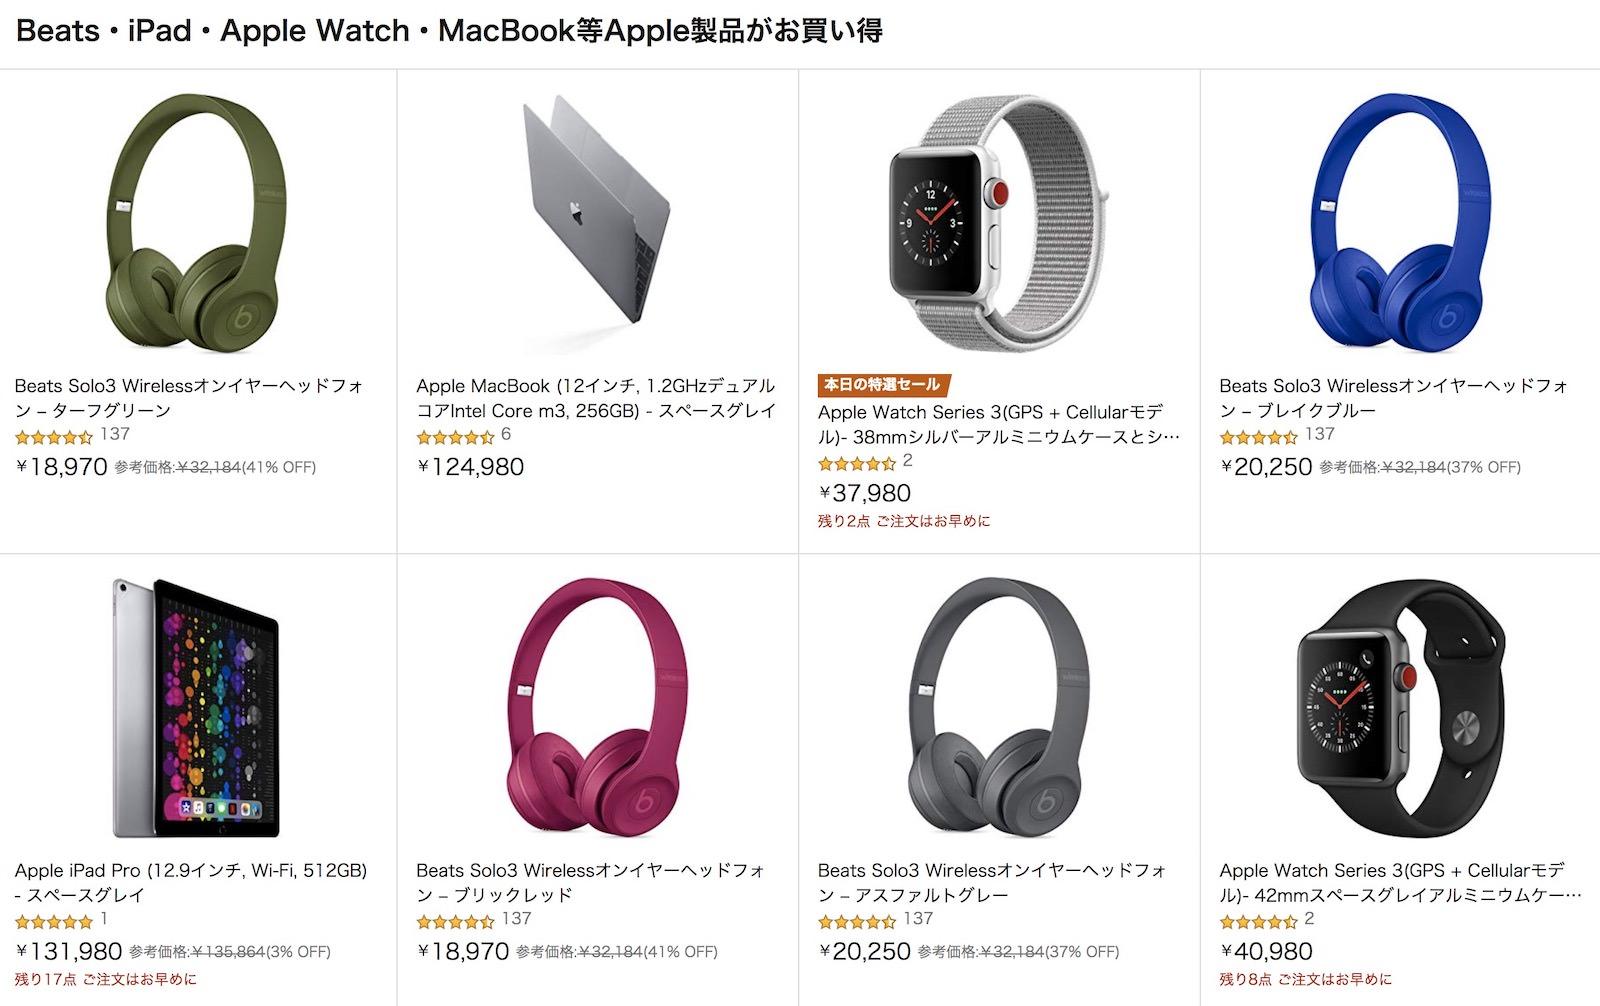 Beats iPad MacBook AppleWatch Sale